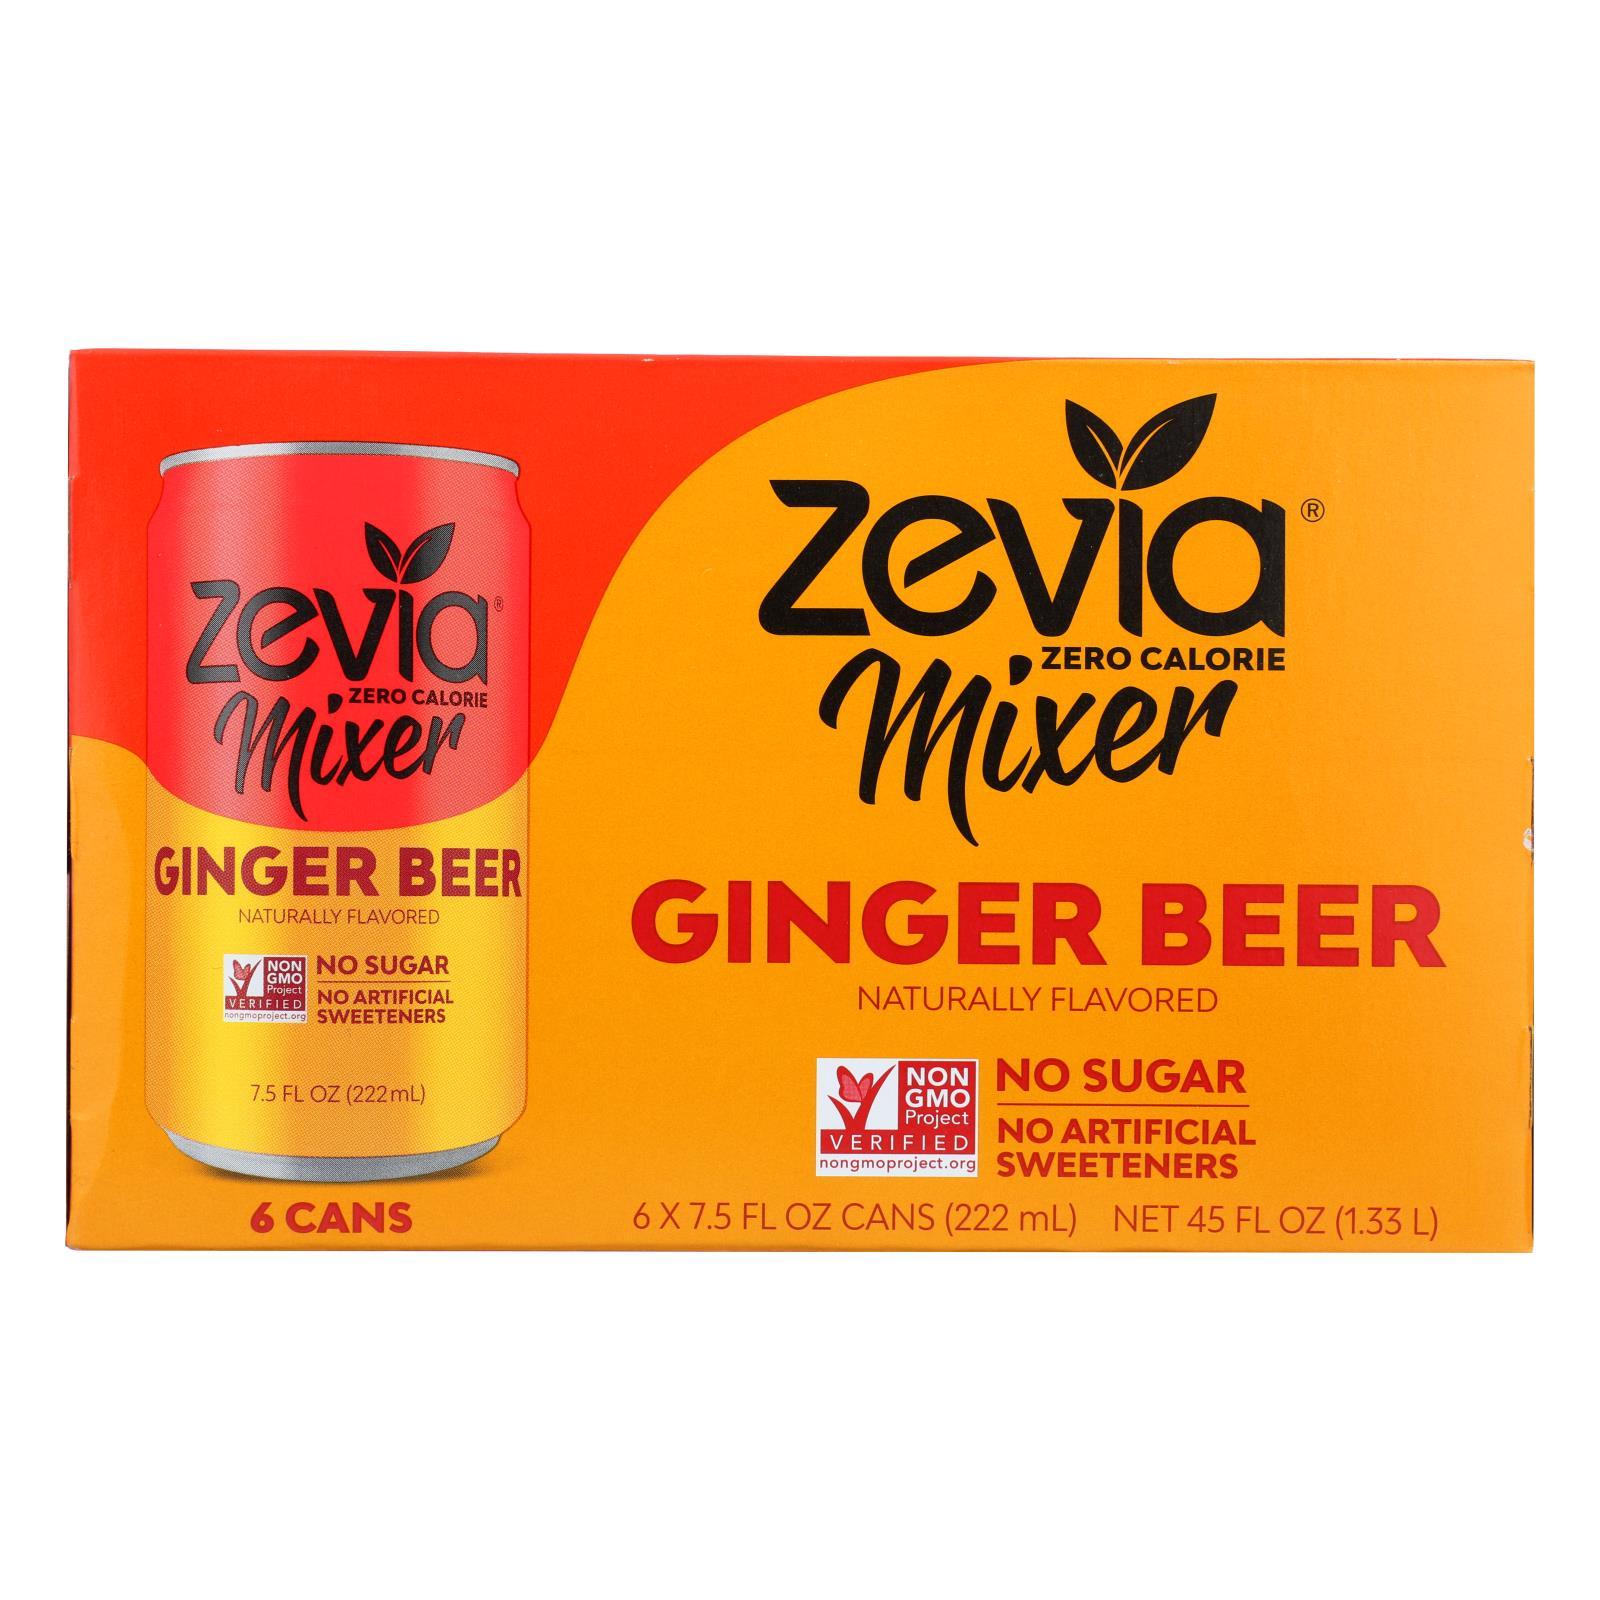 Zevia Zero Calorie Mixer - Ginger Beer - Case of 4 - 6/7.5 fl oz